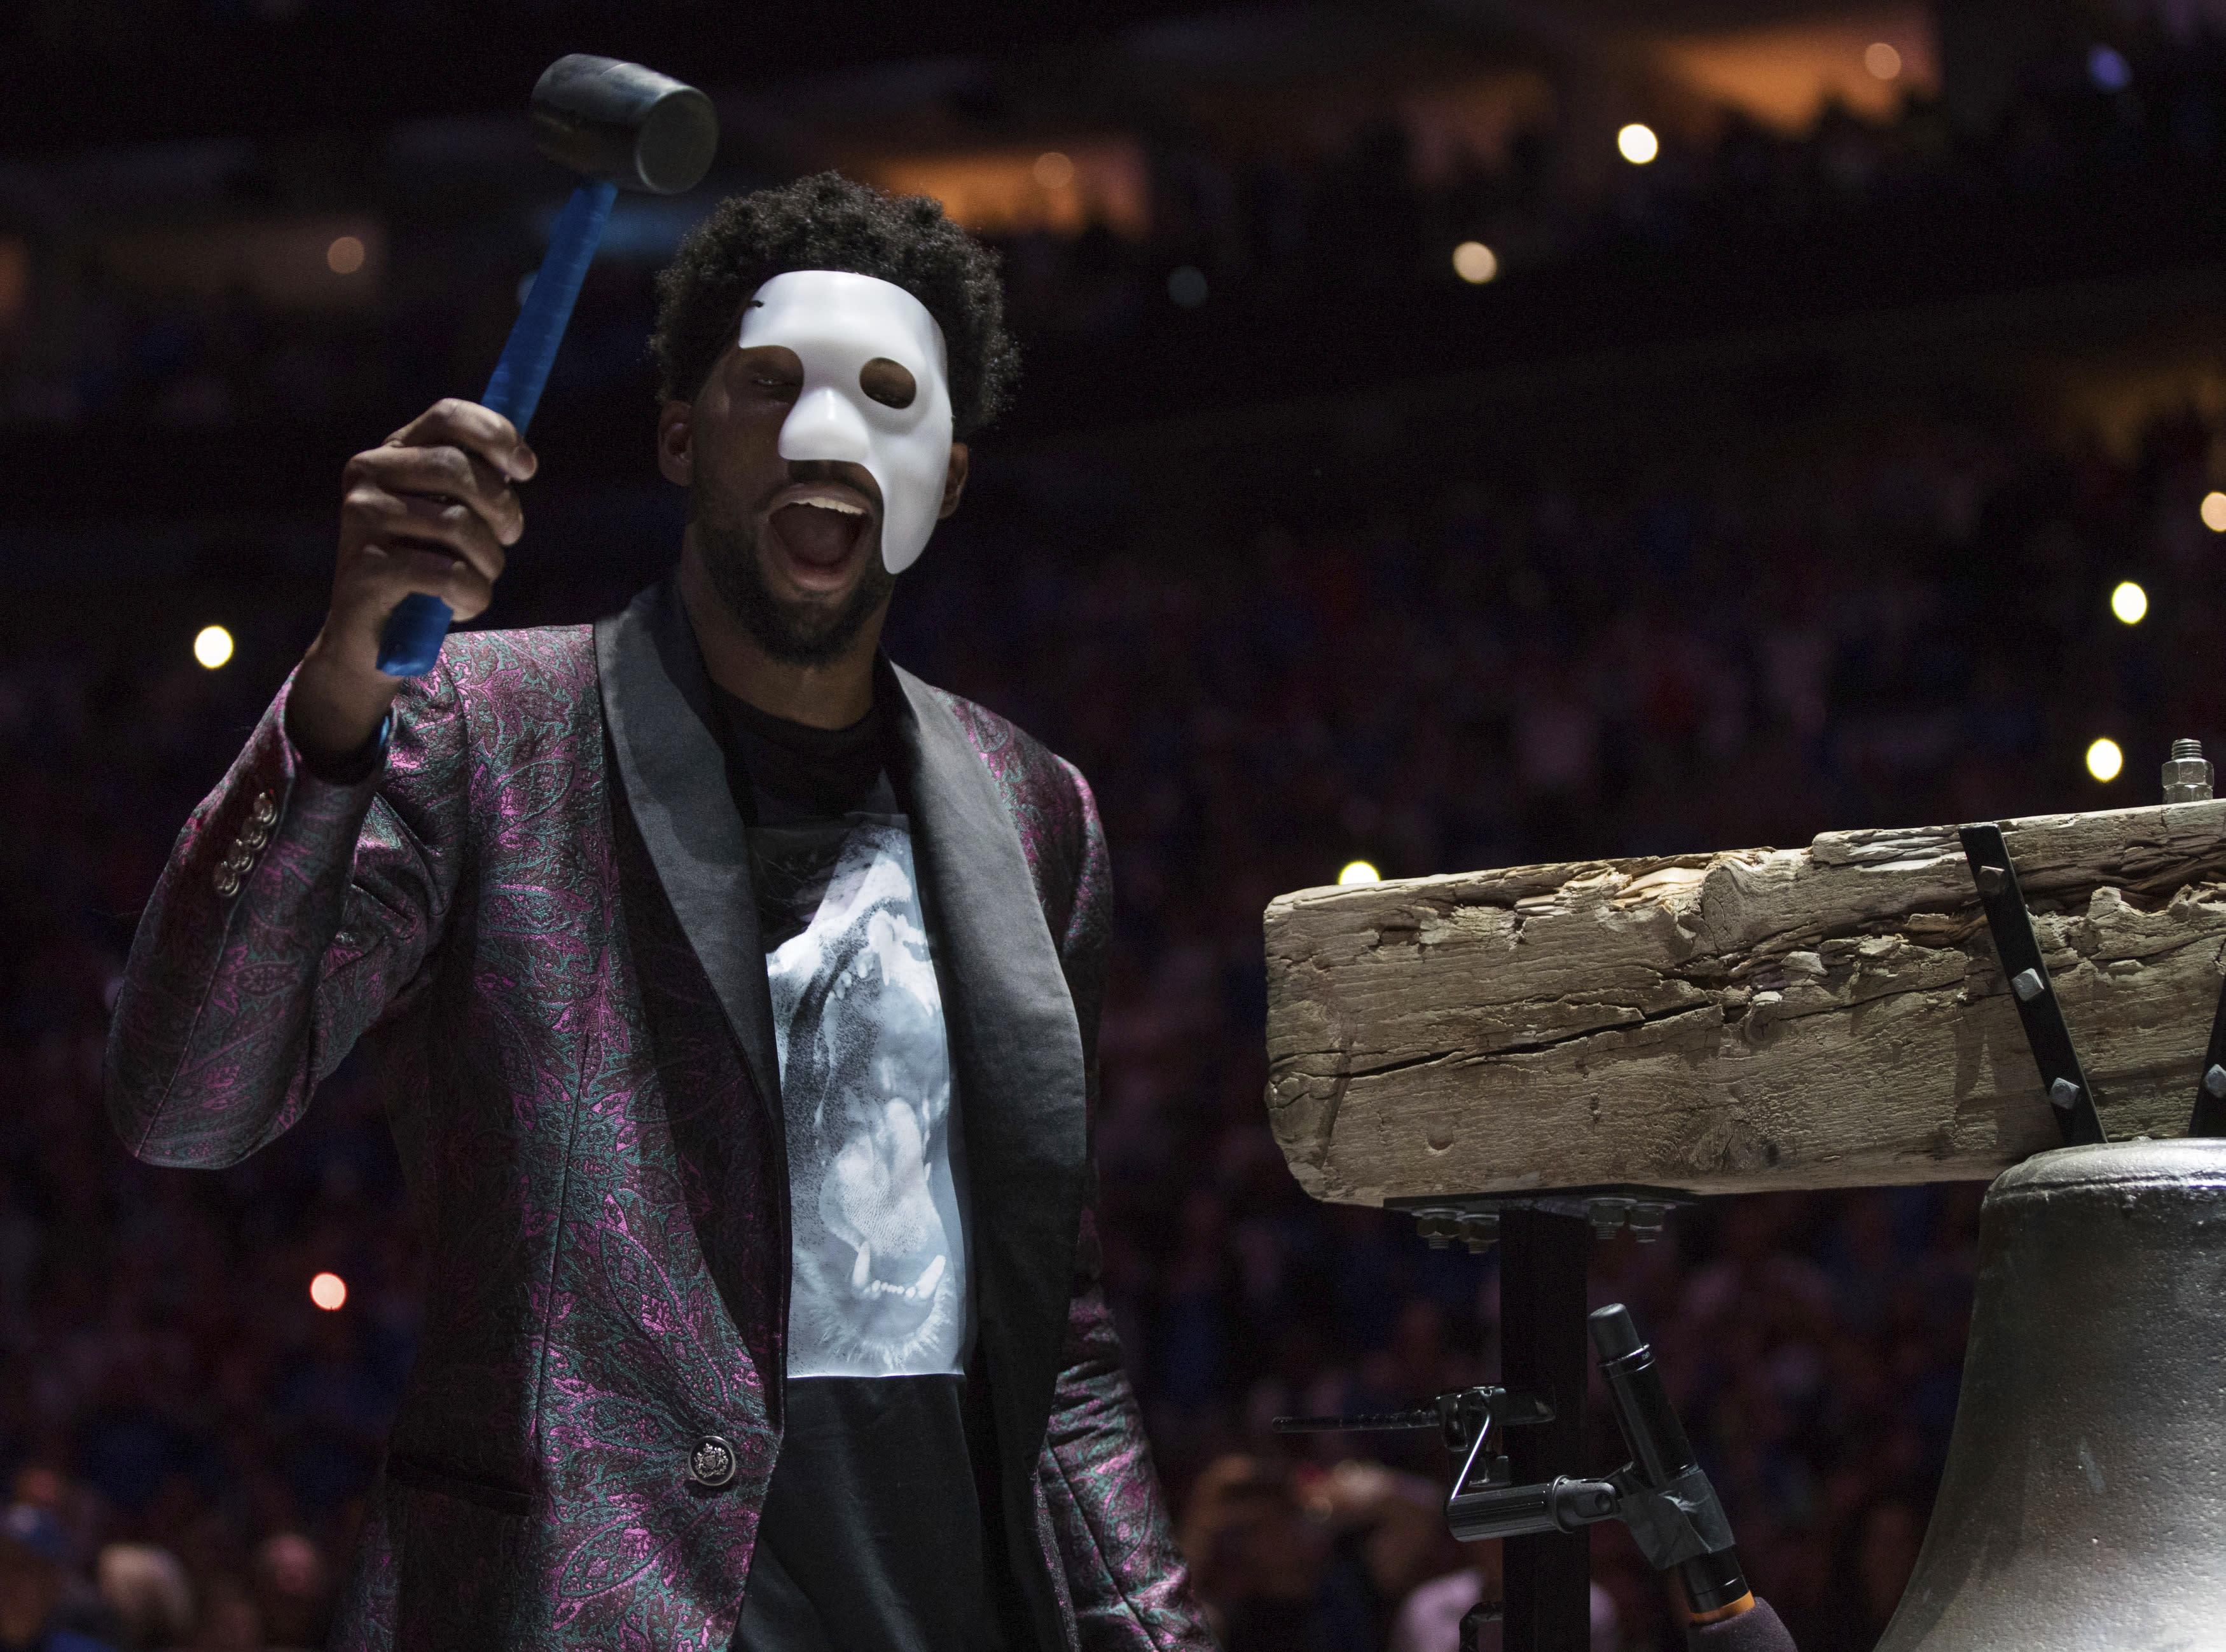 Joel Embiid gets new mask, still doubtful for Philadelphia